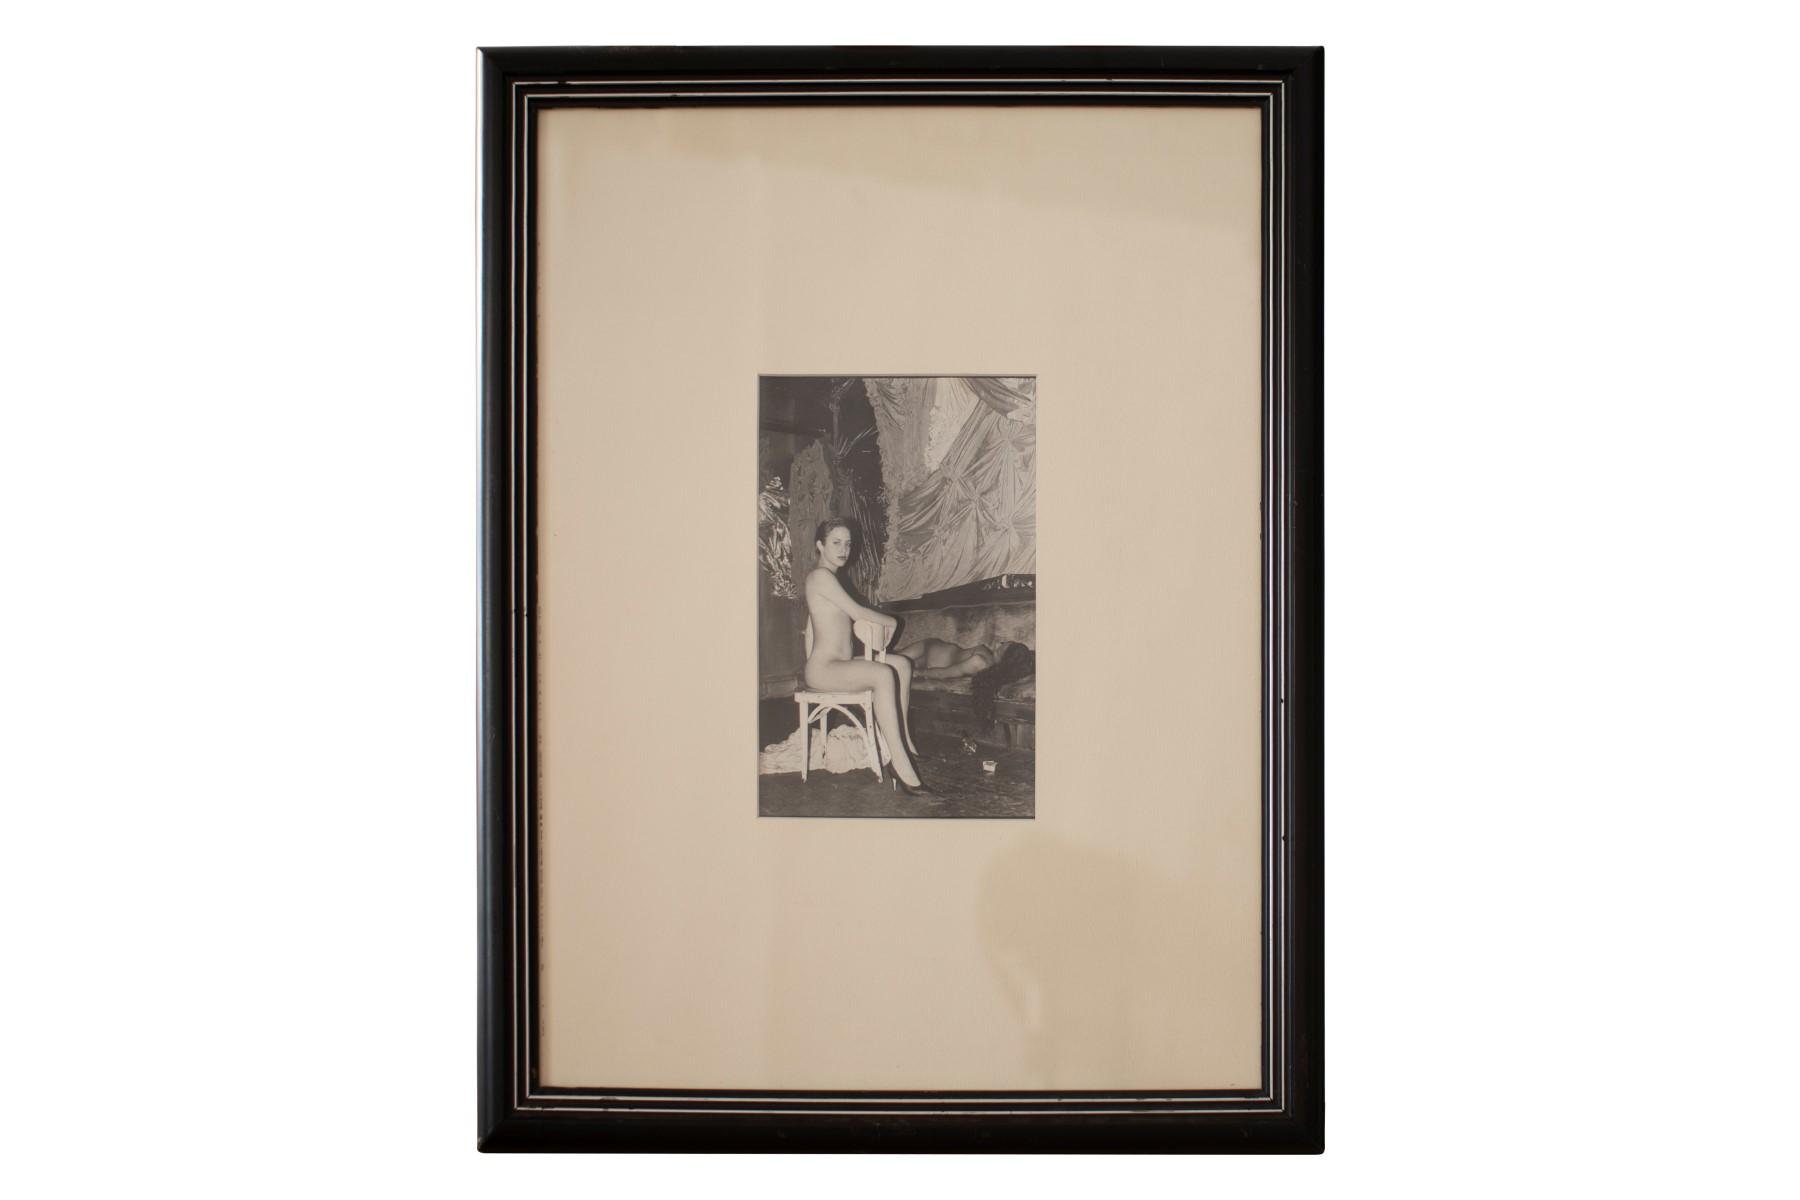 #113 Stephan Lupino* (b. 1952), Adrivana a Mexican Beauty, 1970, Photo | Stephan Lupino* (1952), Adrivana a Mexican Beauty, 1970, Foto Image